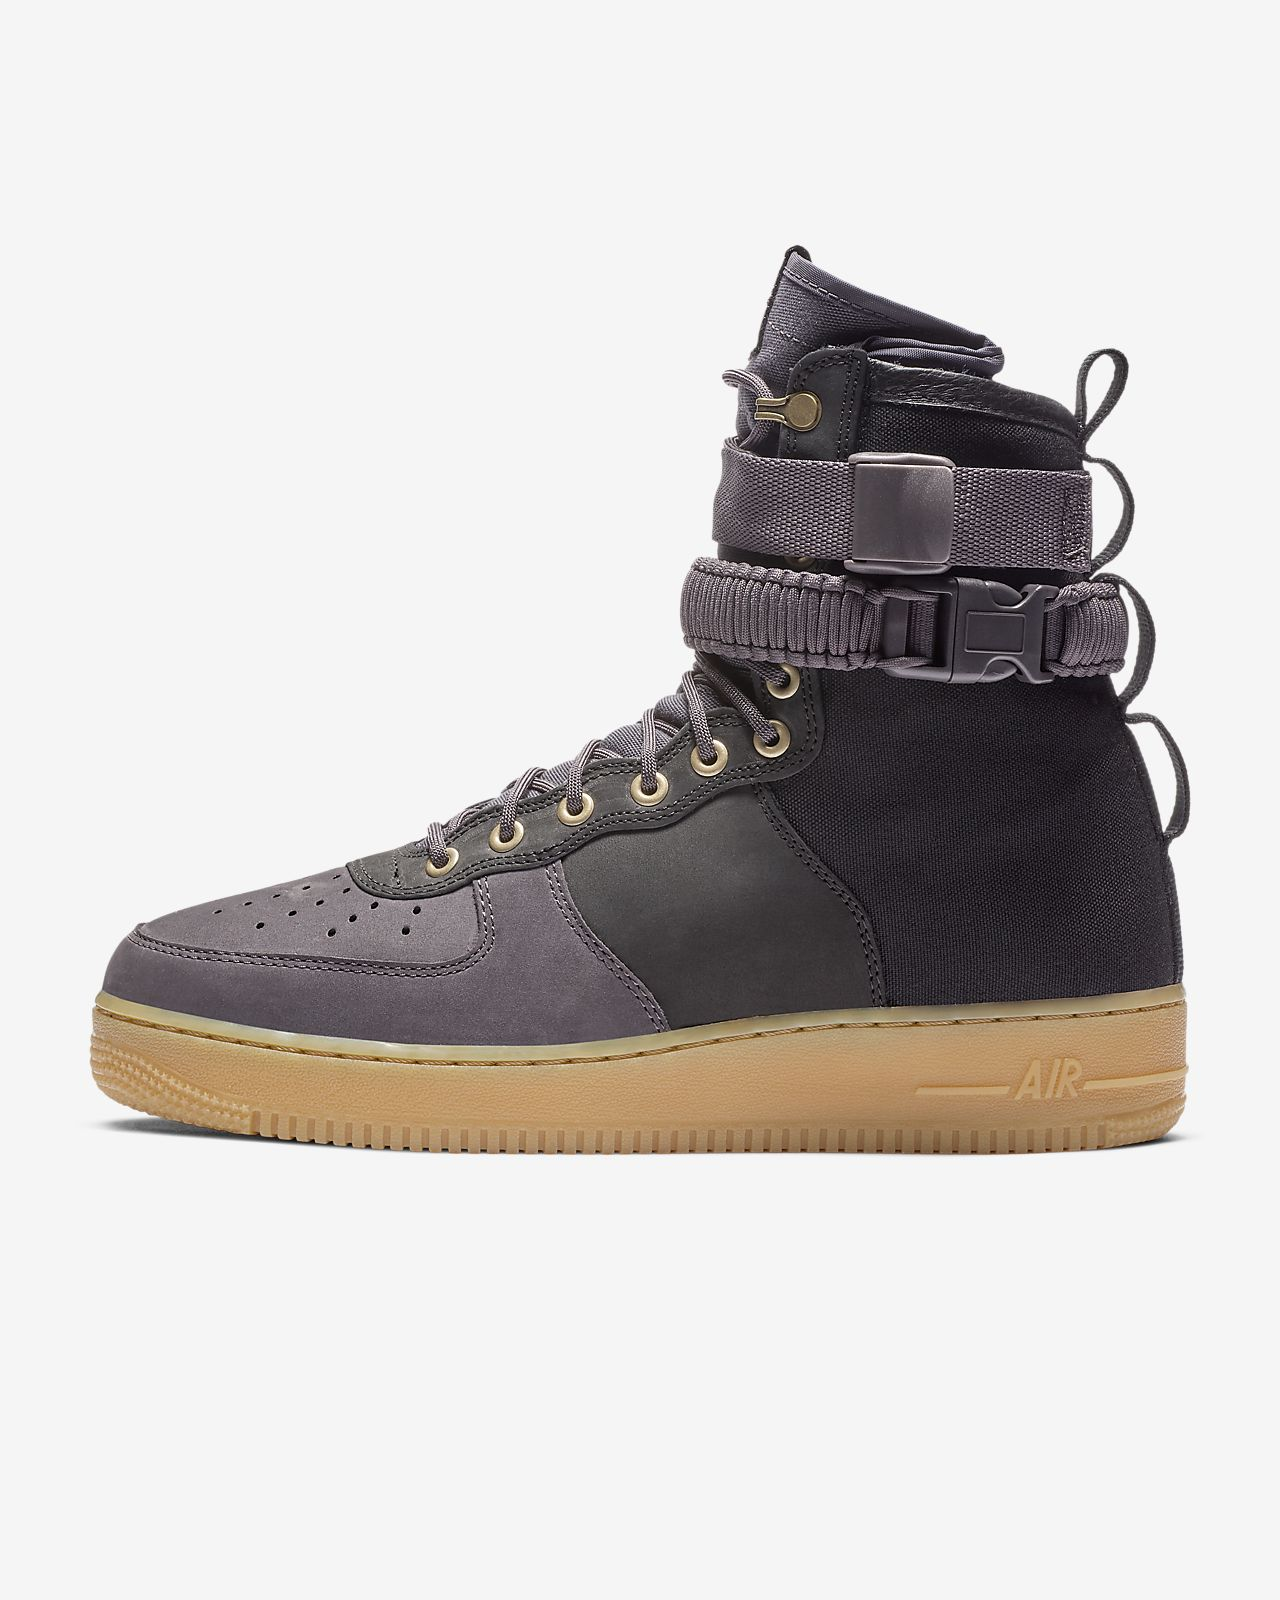 official photos 24415 cd1d8 Chaussure Nike SF Air Force 1 Premium pour Homme. Nike.com CA